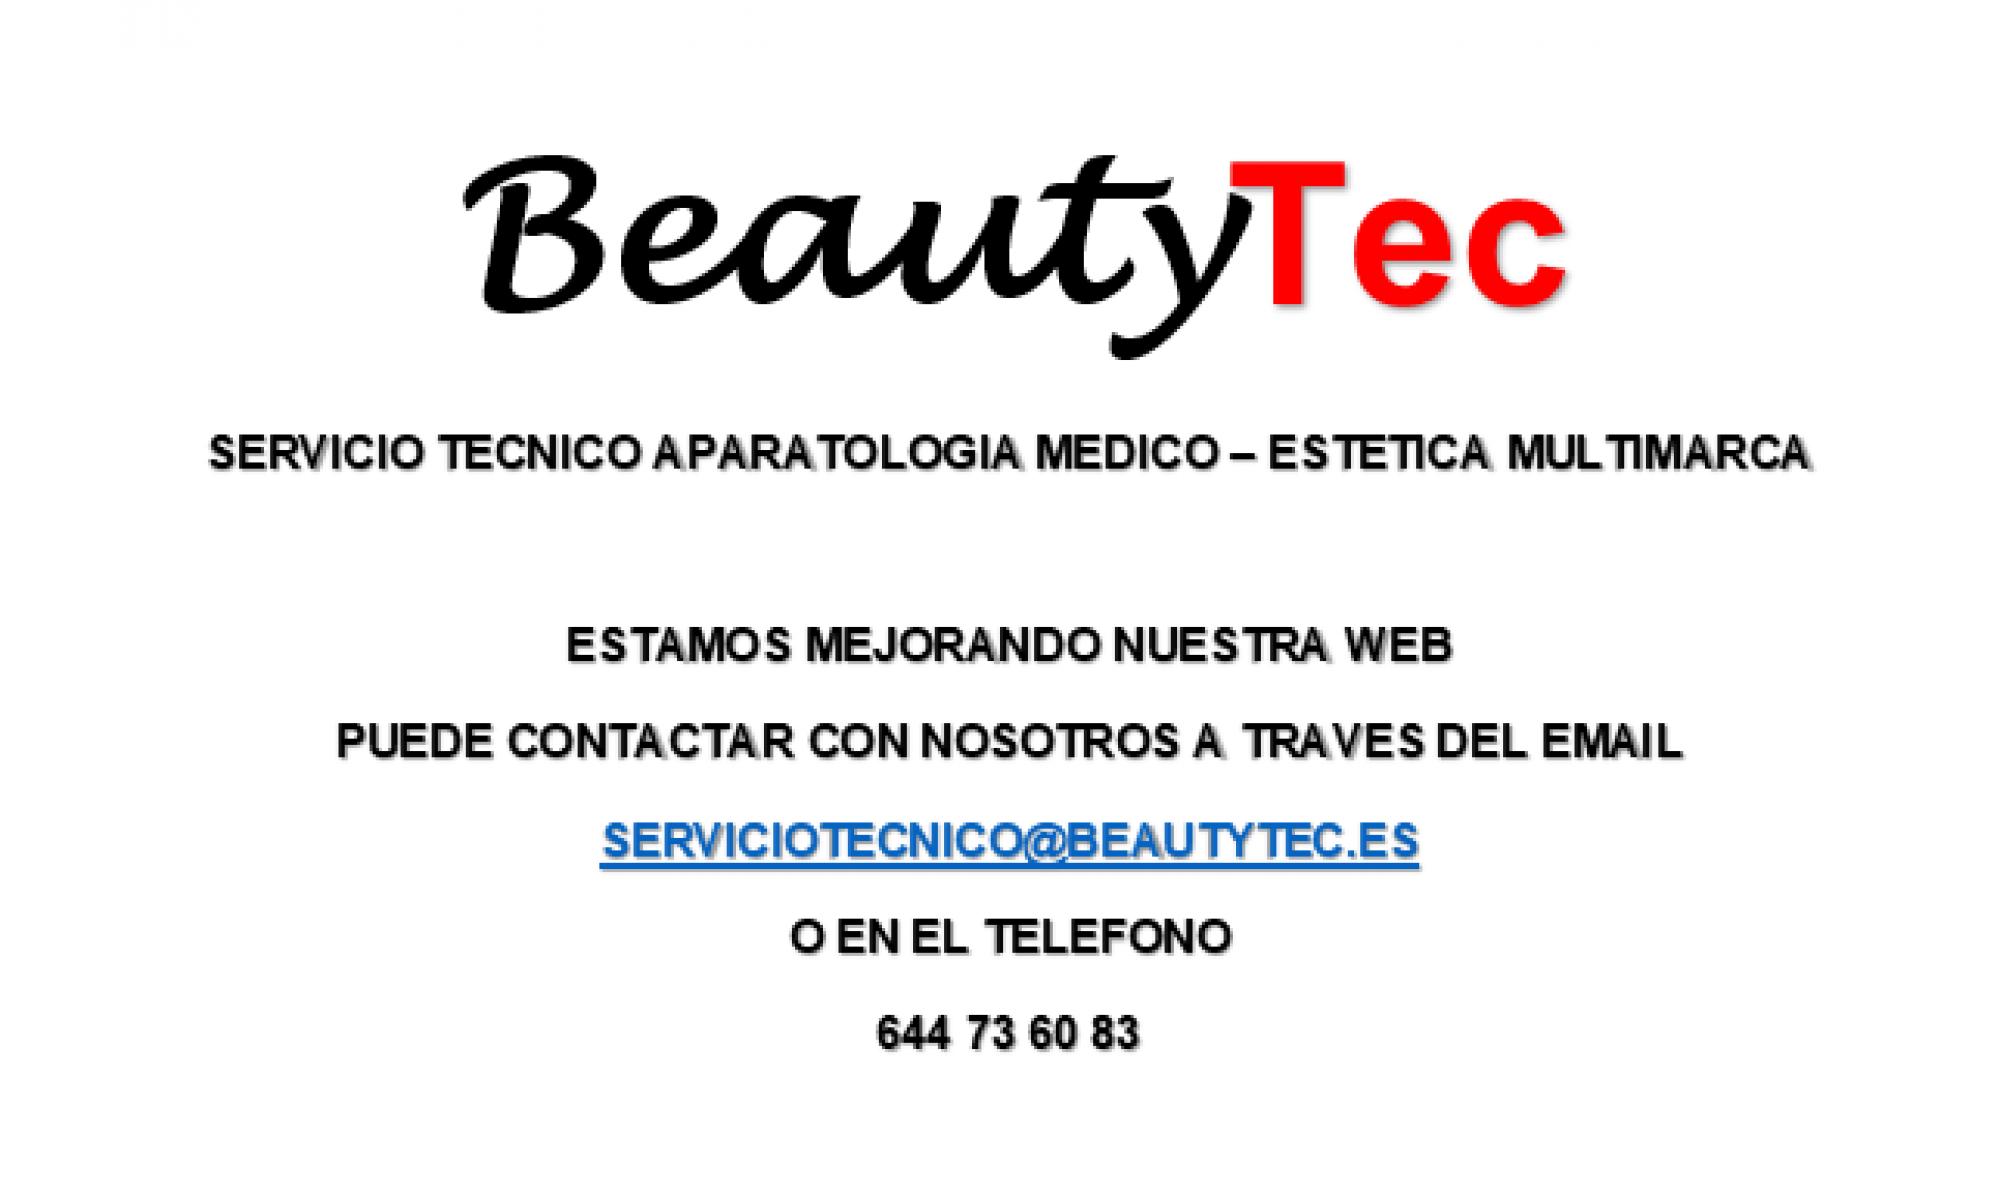 BeautyTec